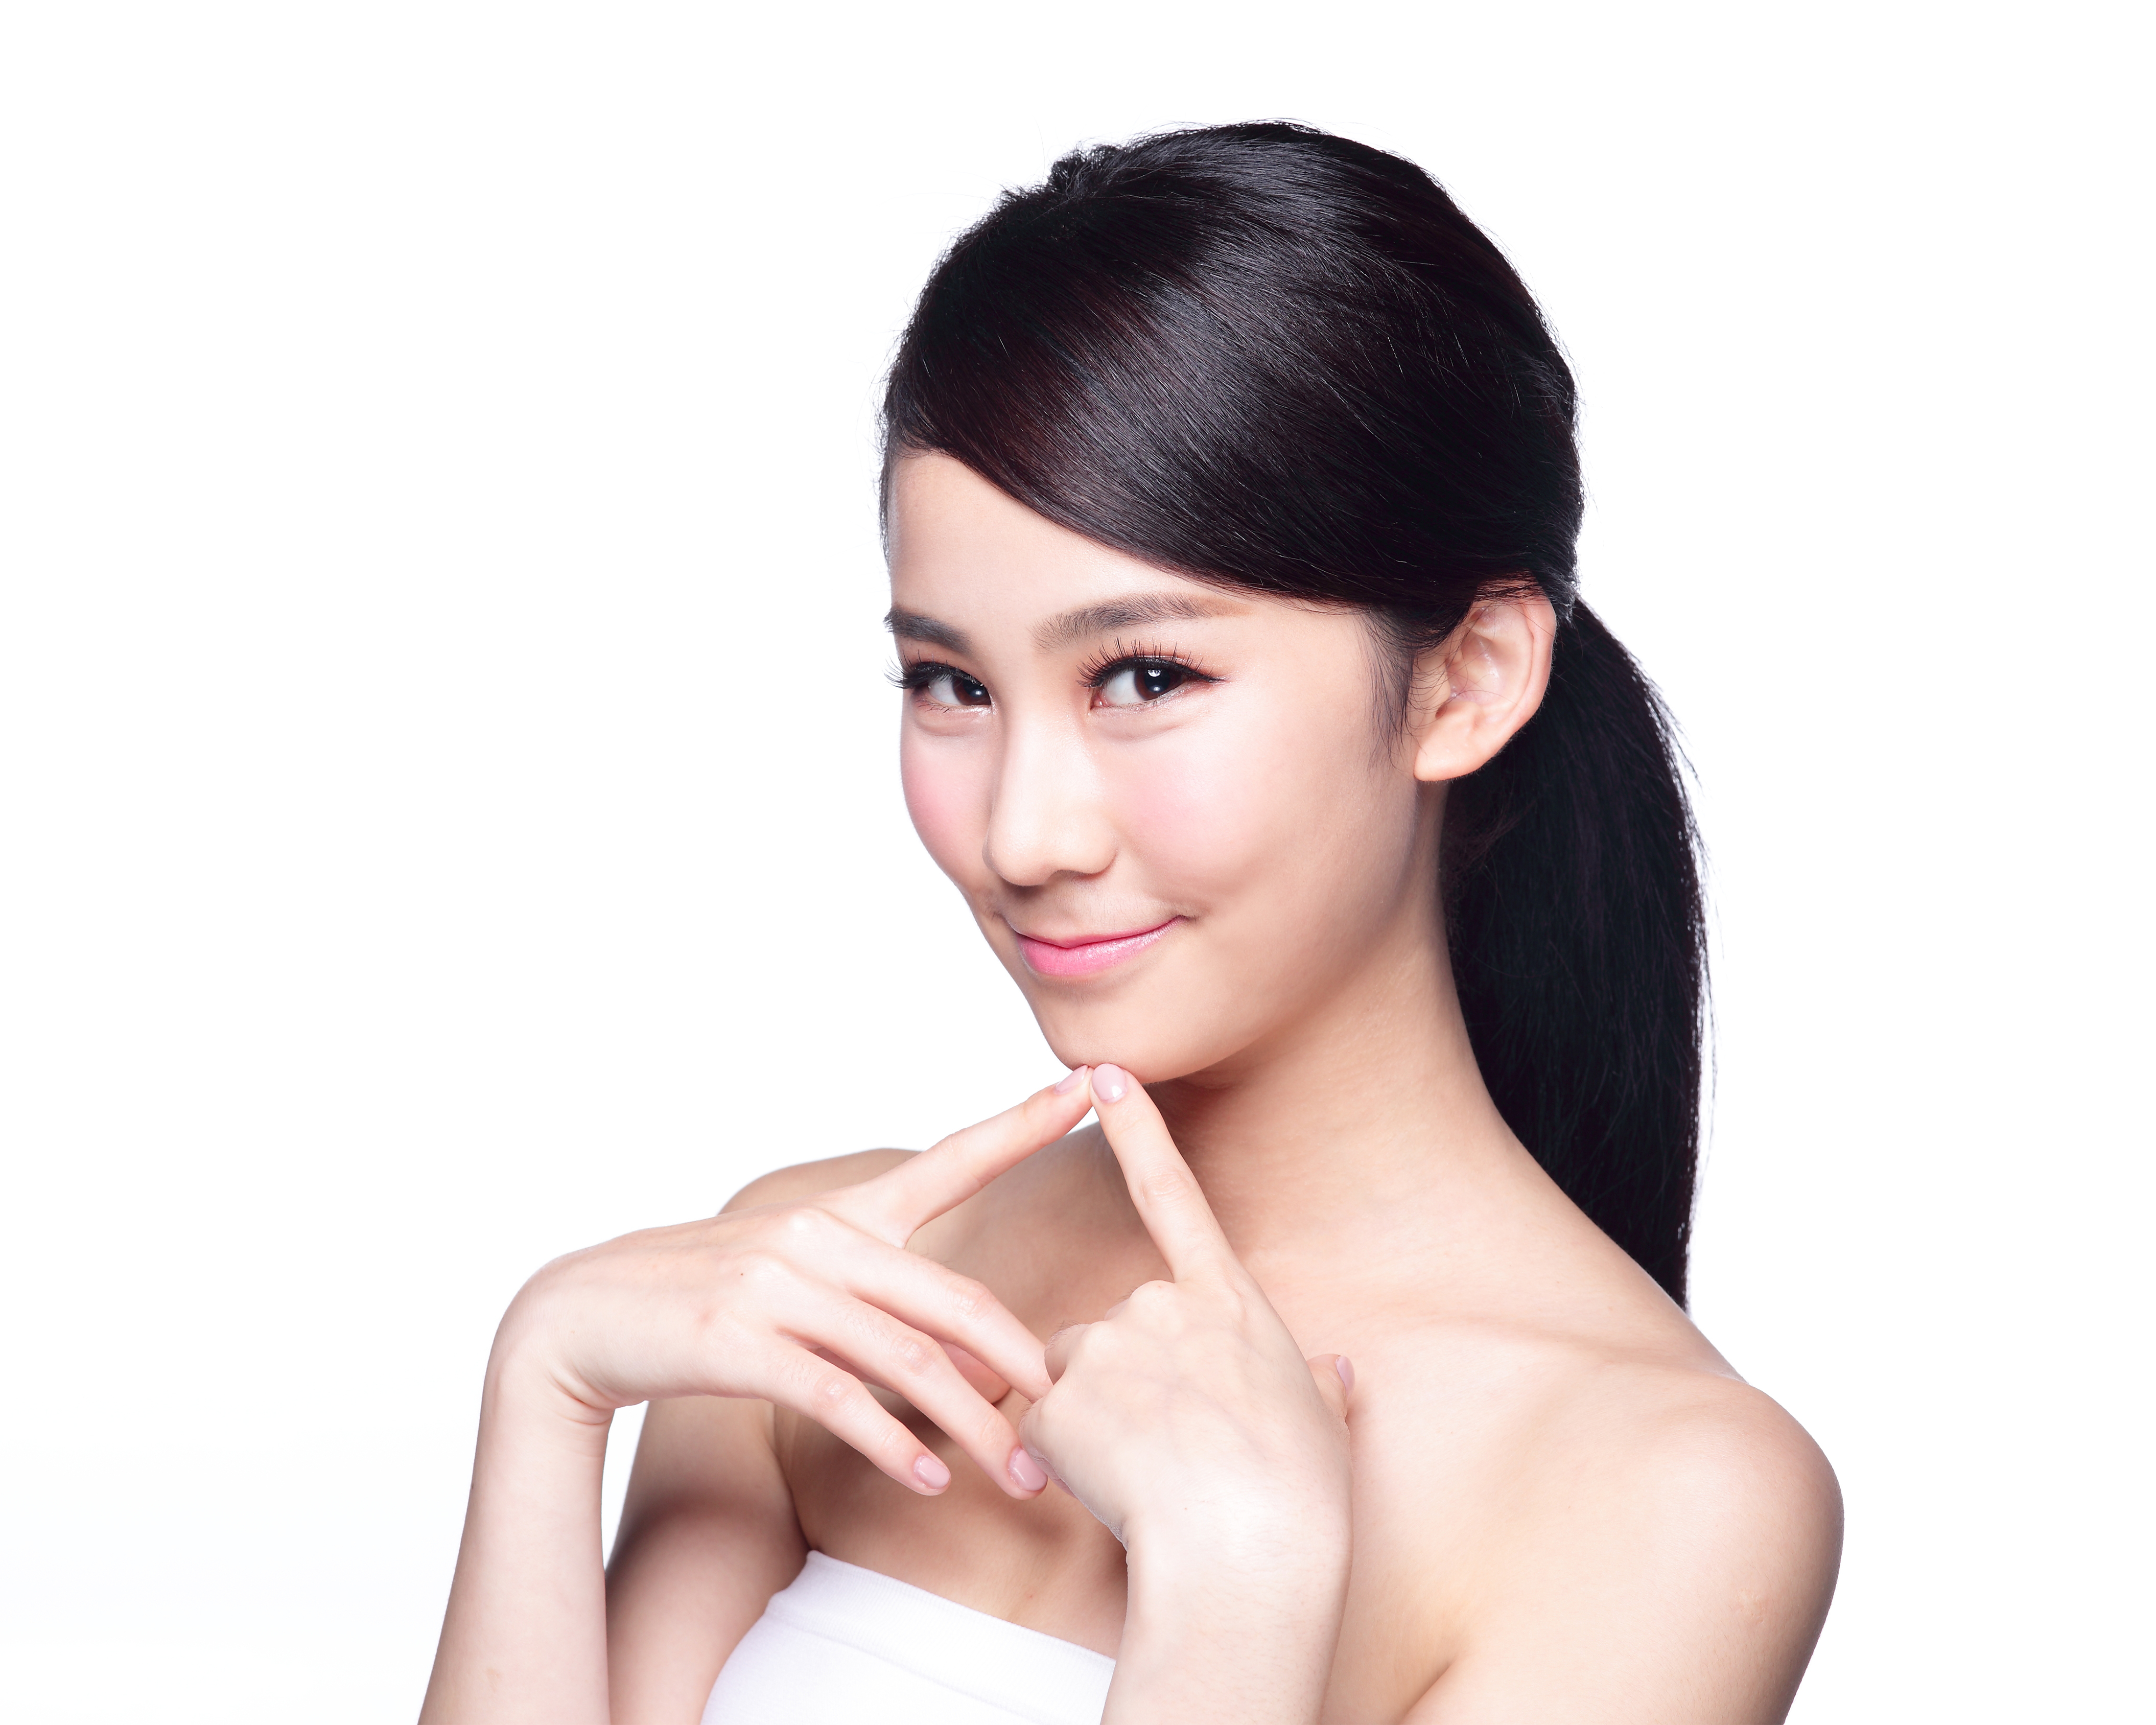 bigstock-Beautiful-Skin-Care-Woman-Face-84209012.jpg